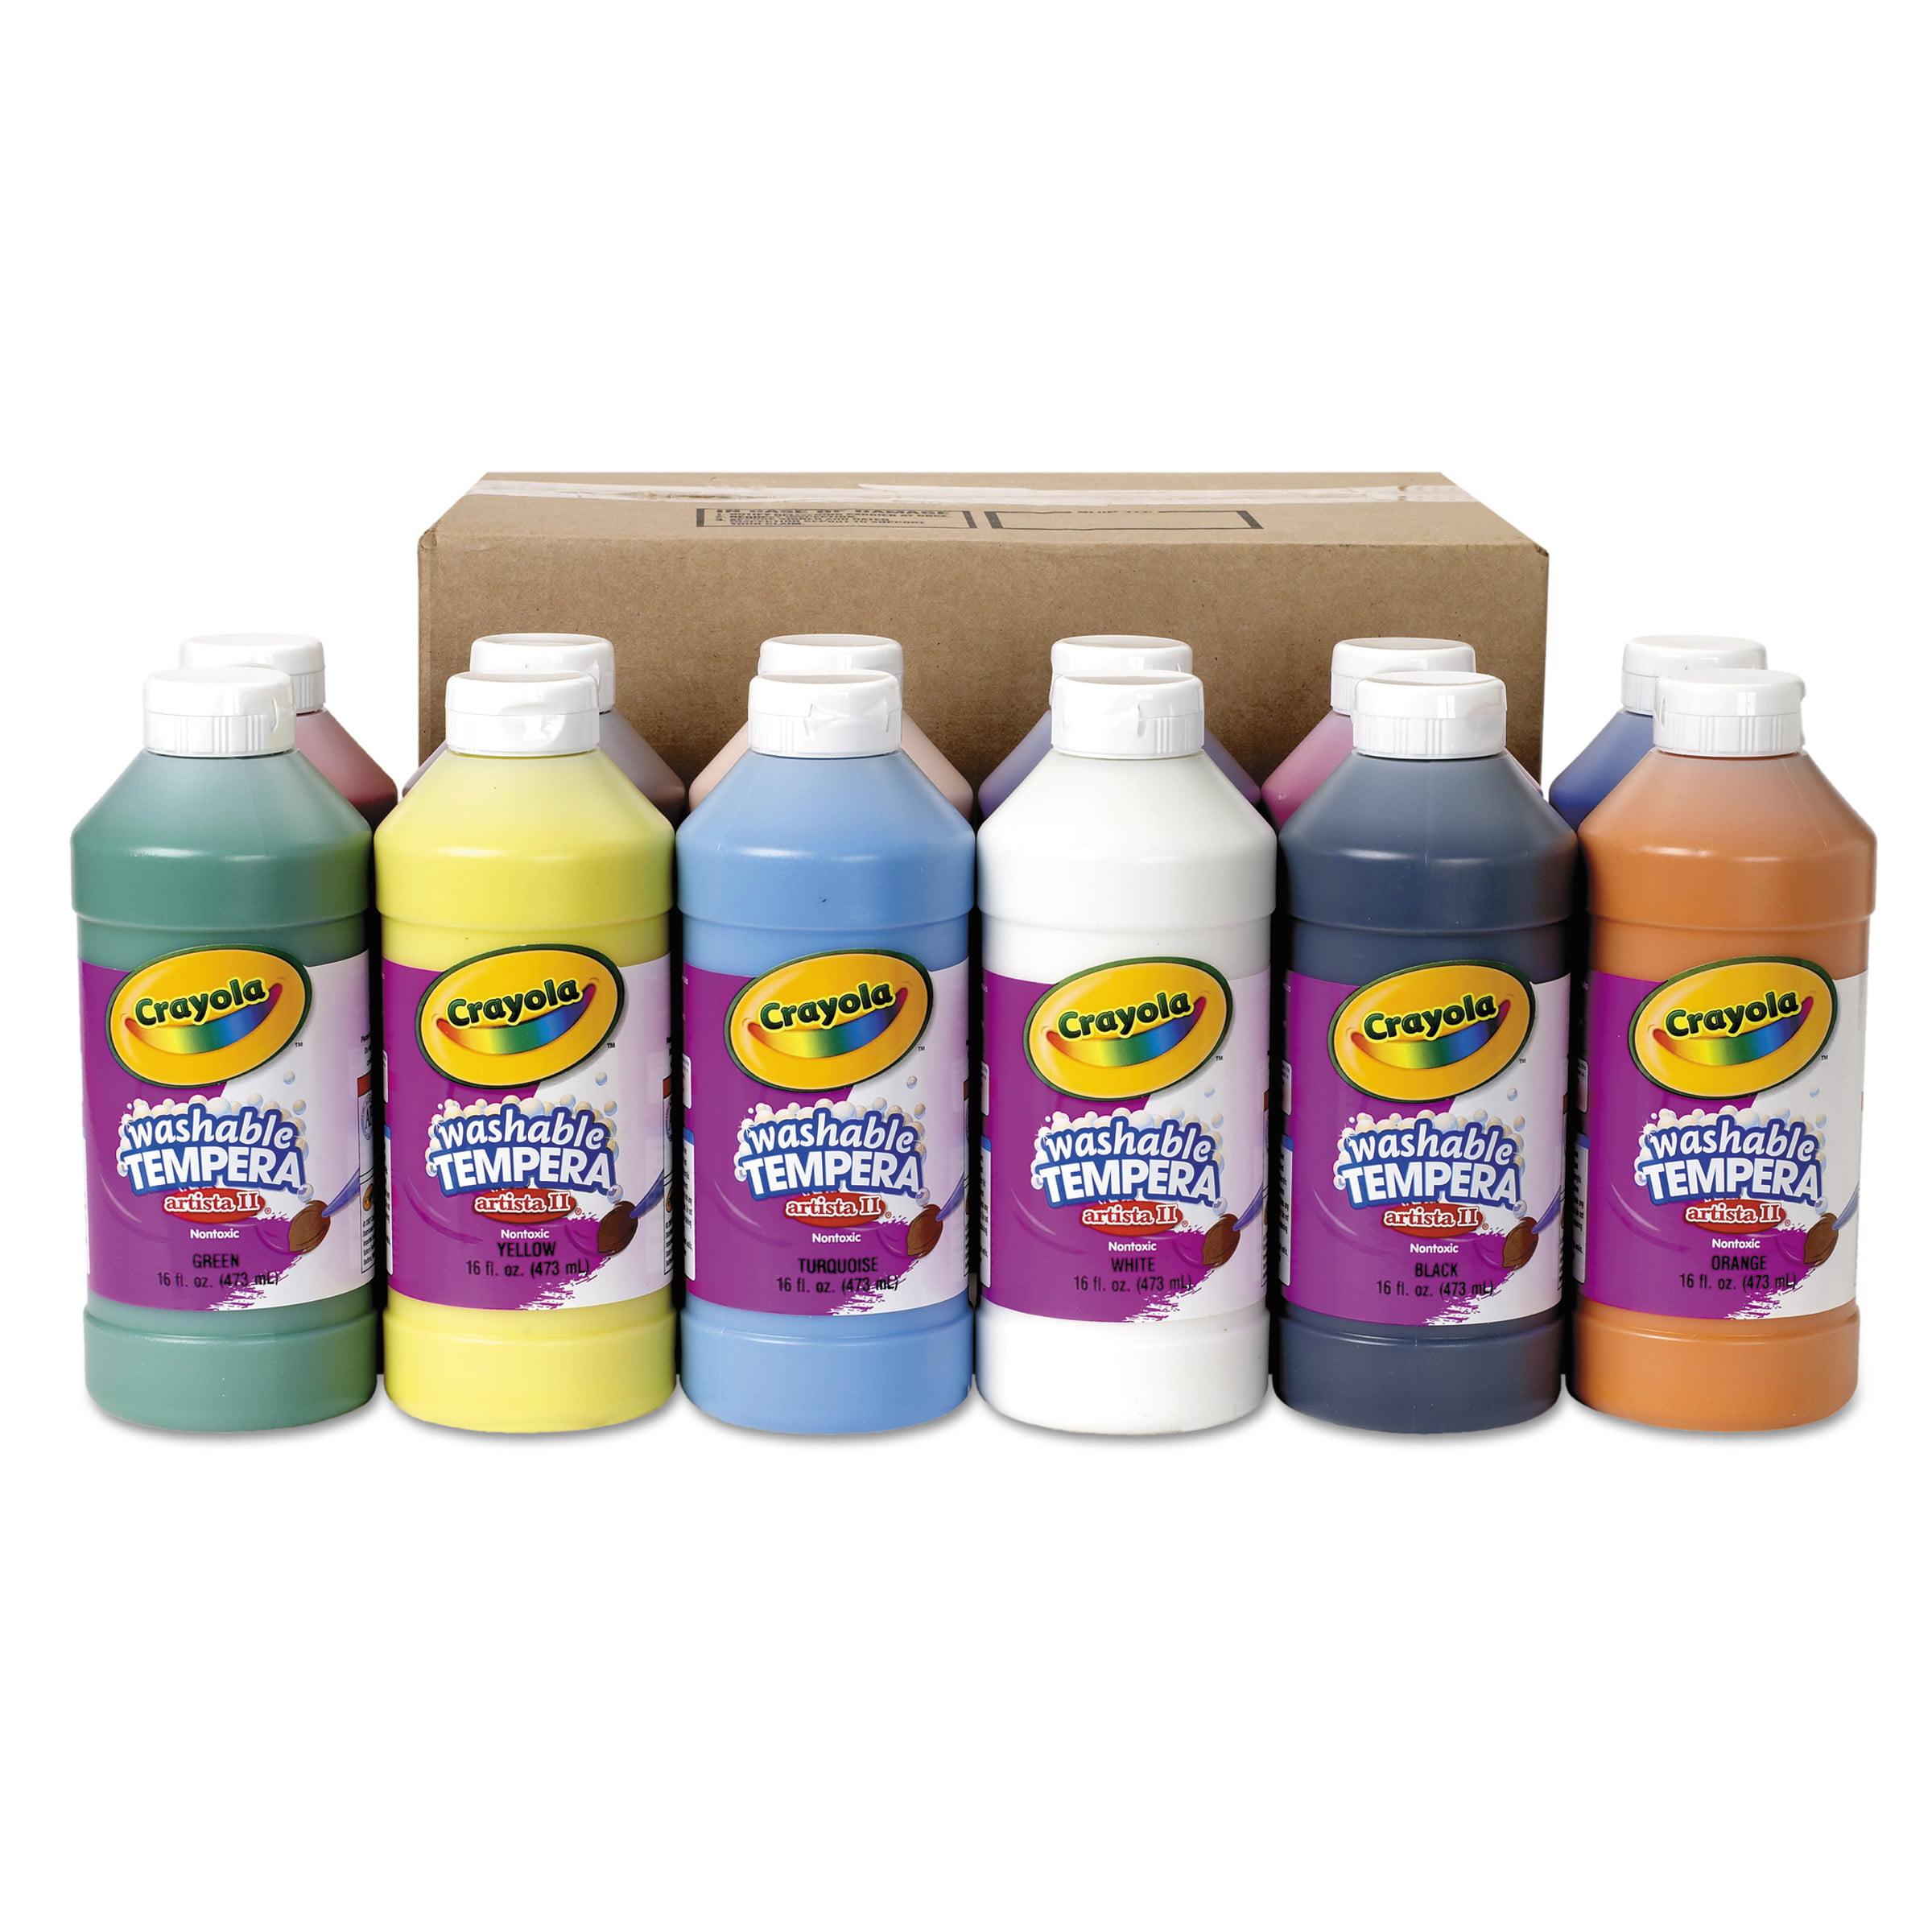 Crayola Washable Paint, Assorted, 16 Oz Bottle, 12 Per Set by BINNEY & SMITH / CRAYOLA